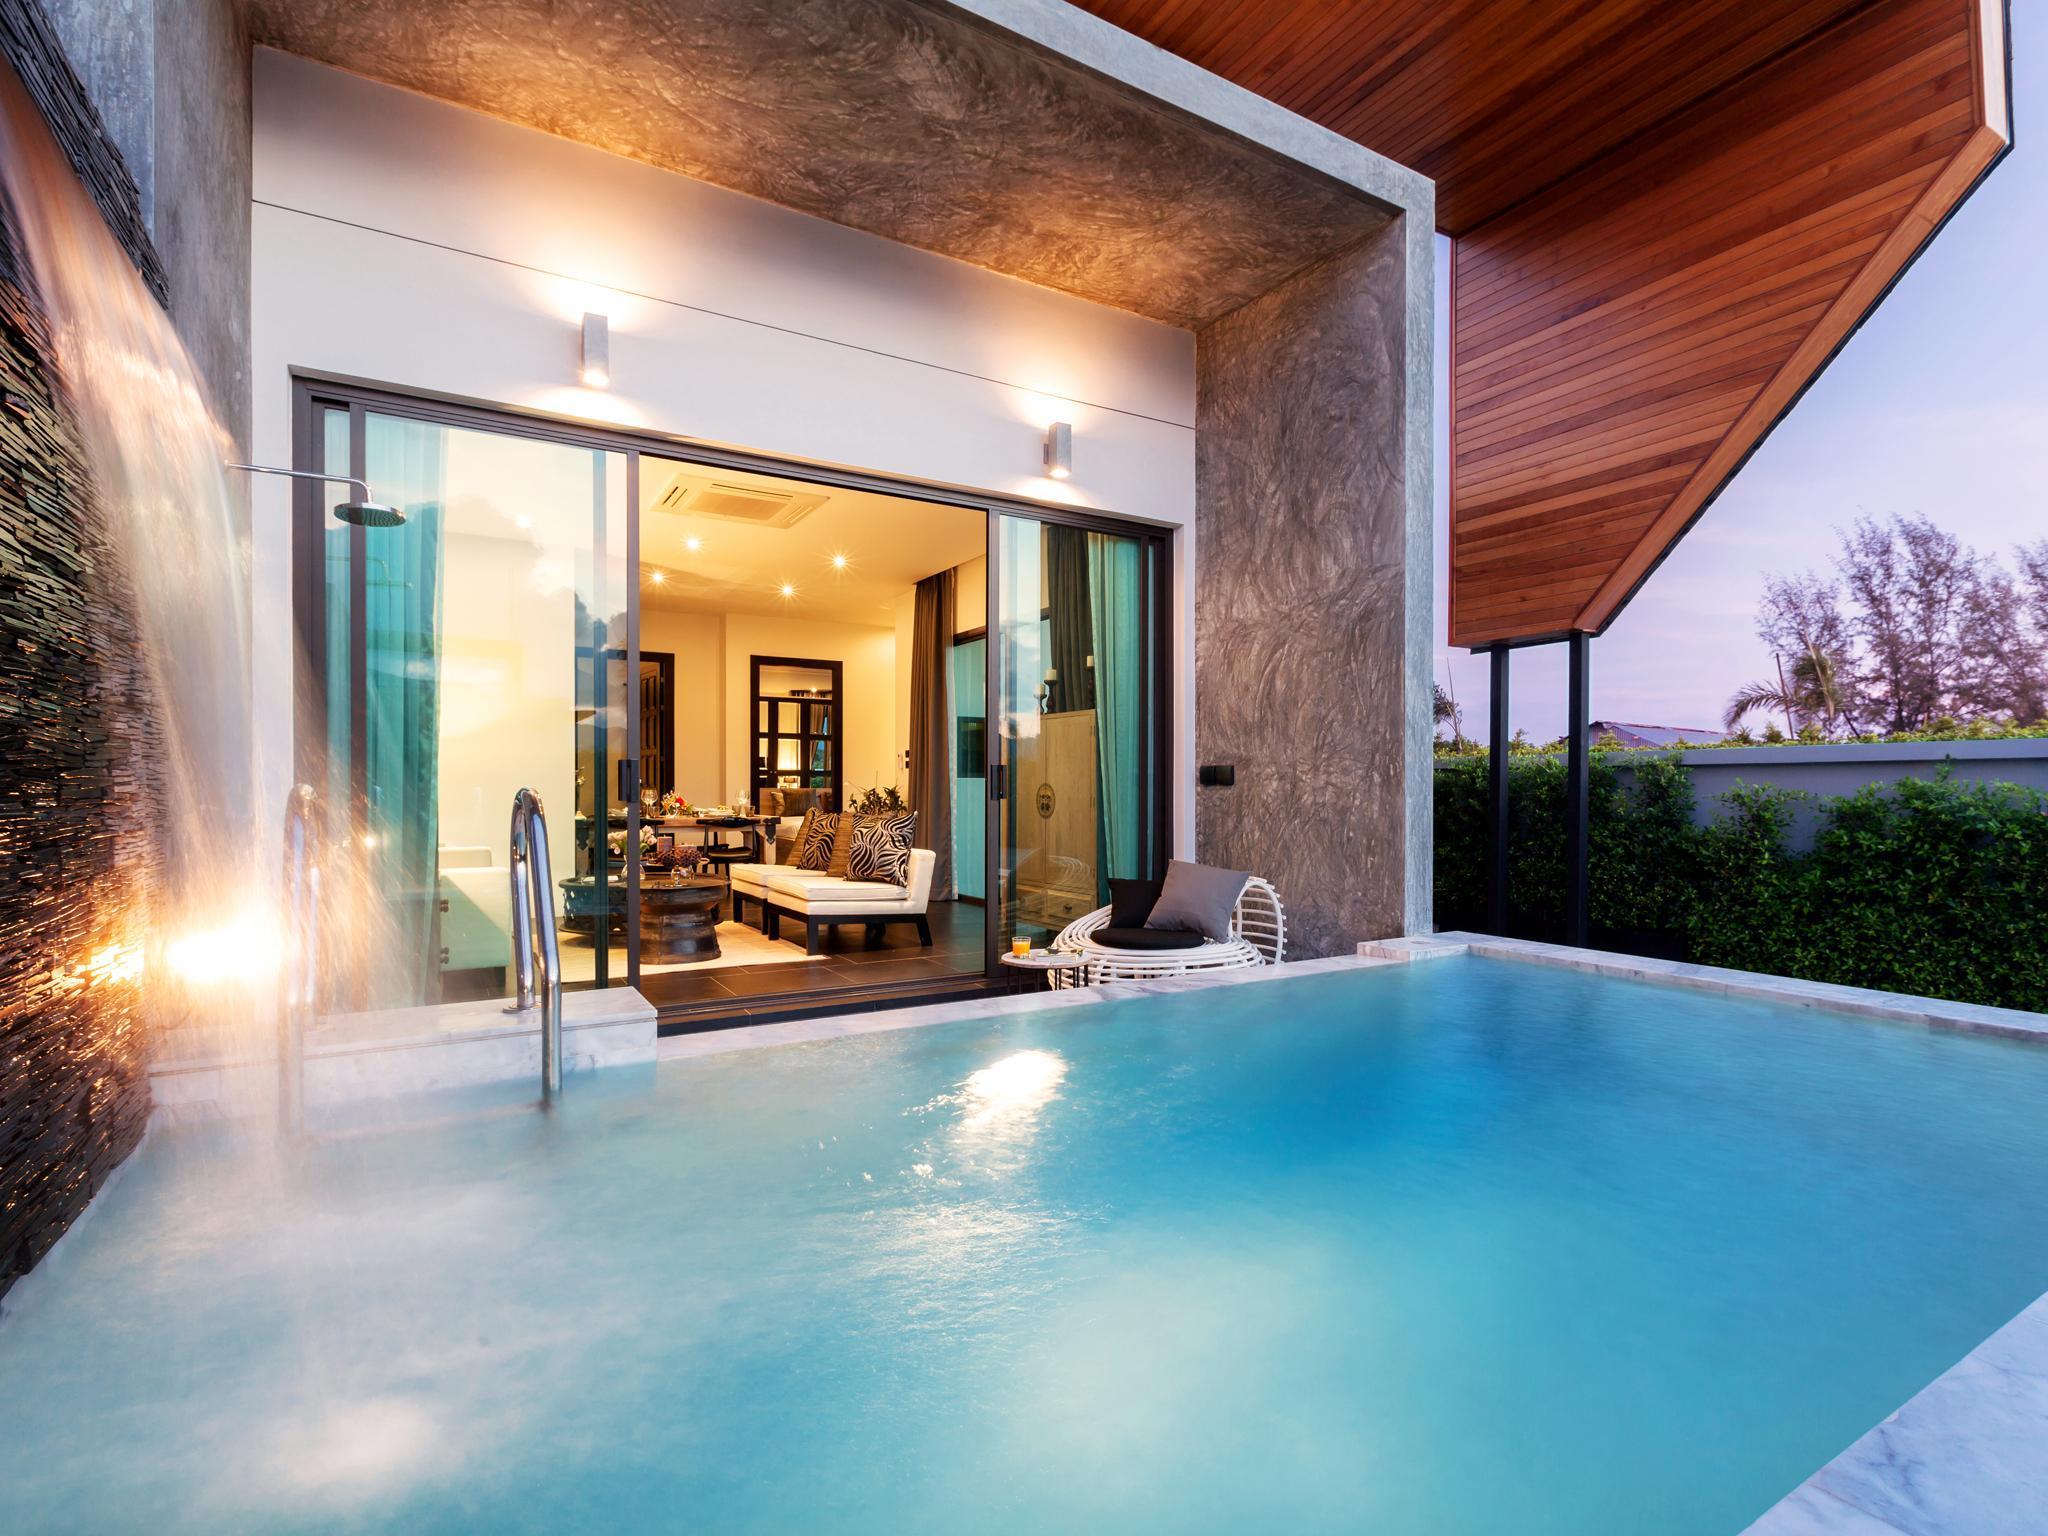 The 8 Pool Villa ดิ เอท พูล วิลลา